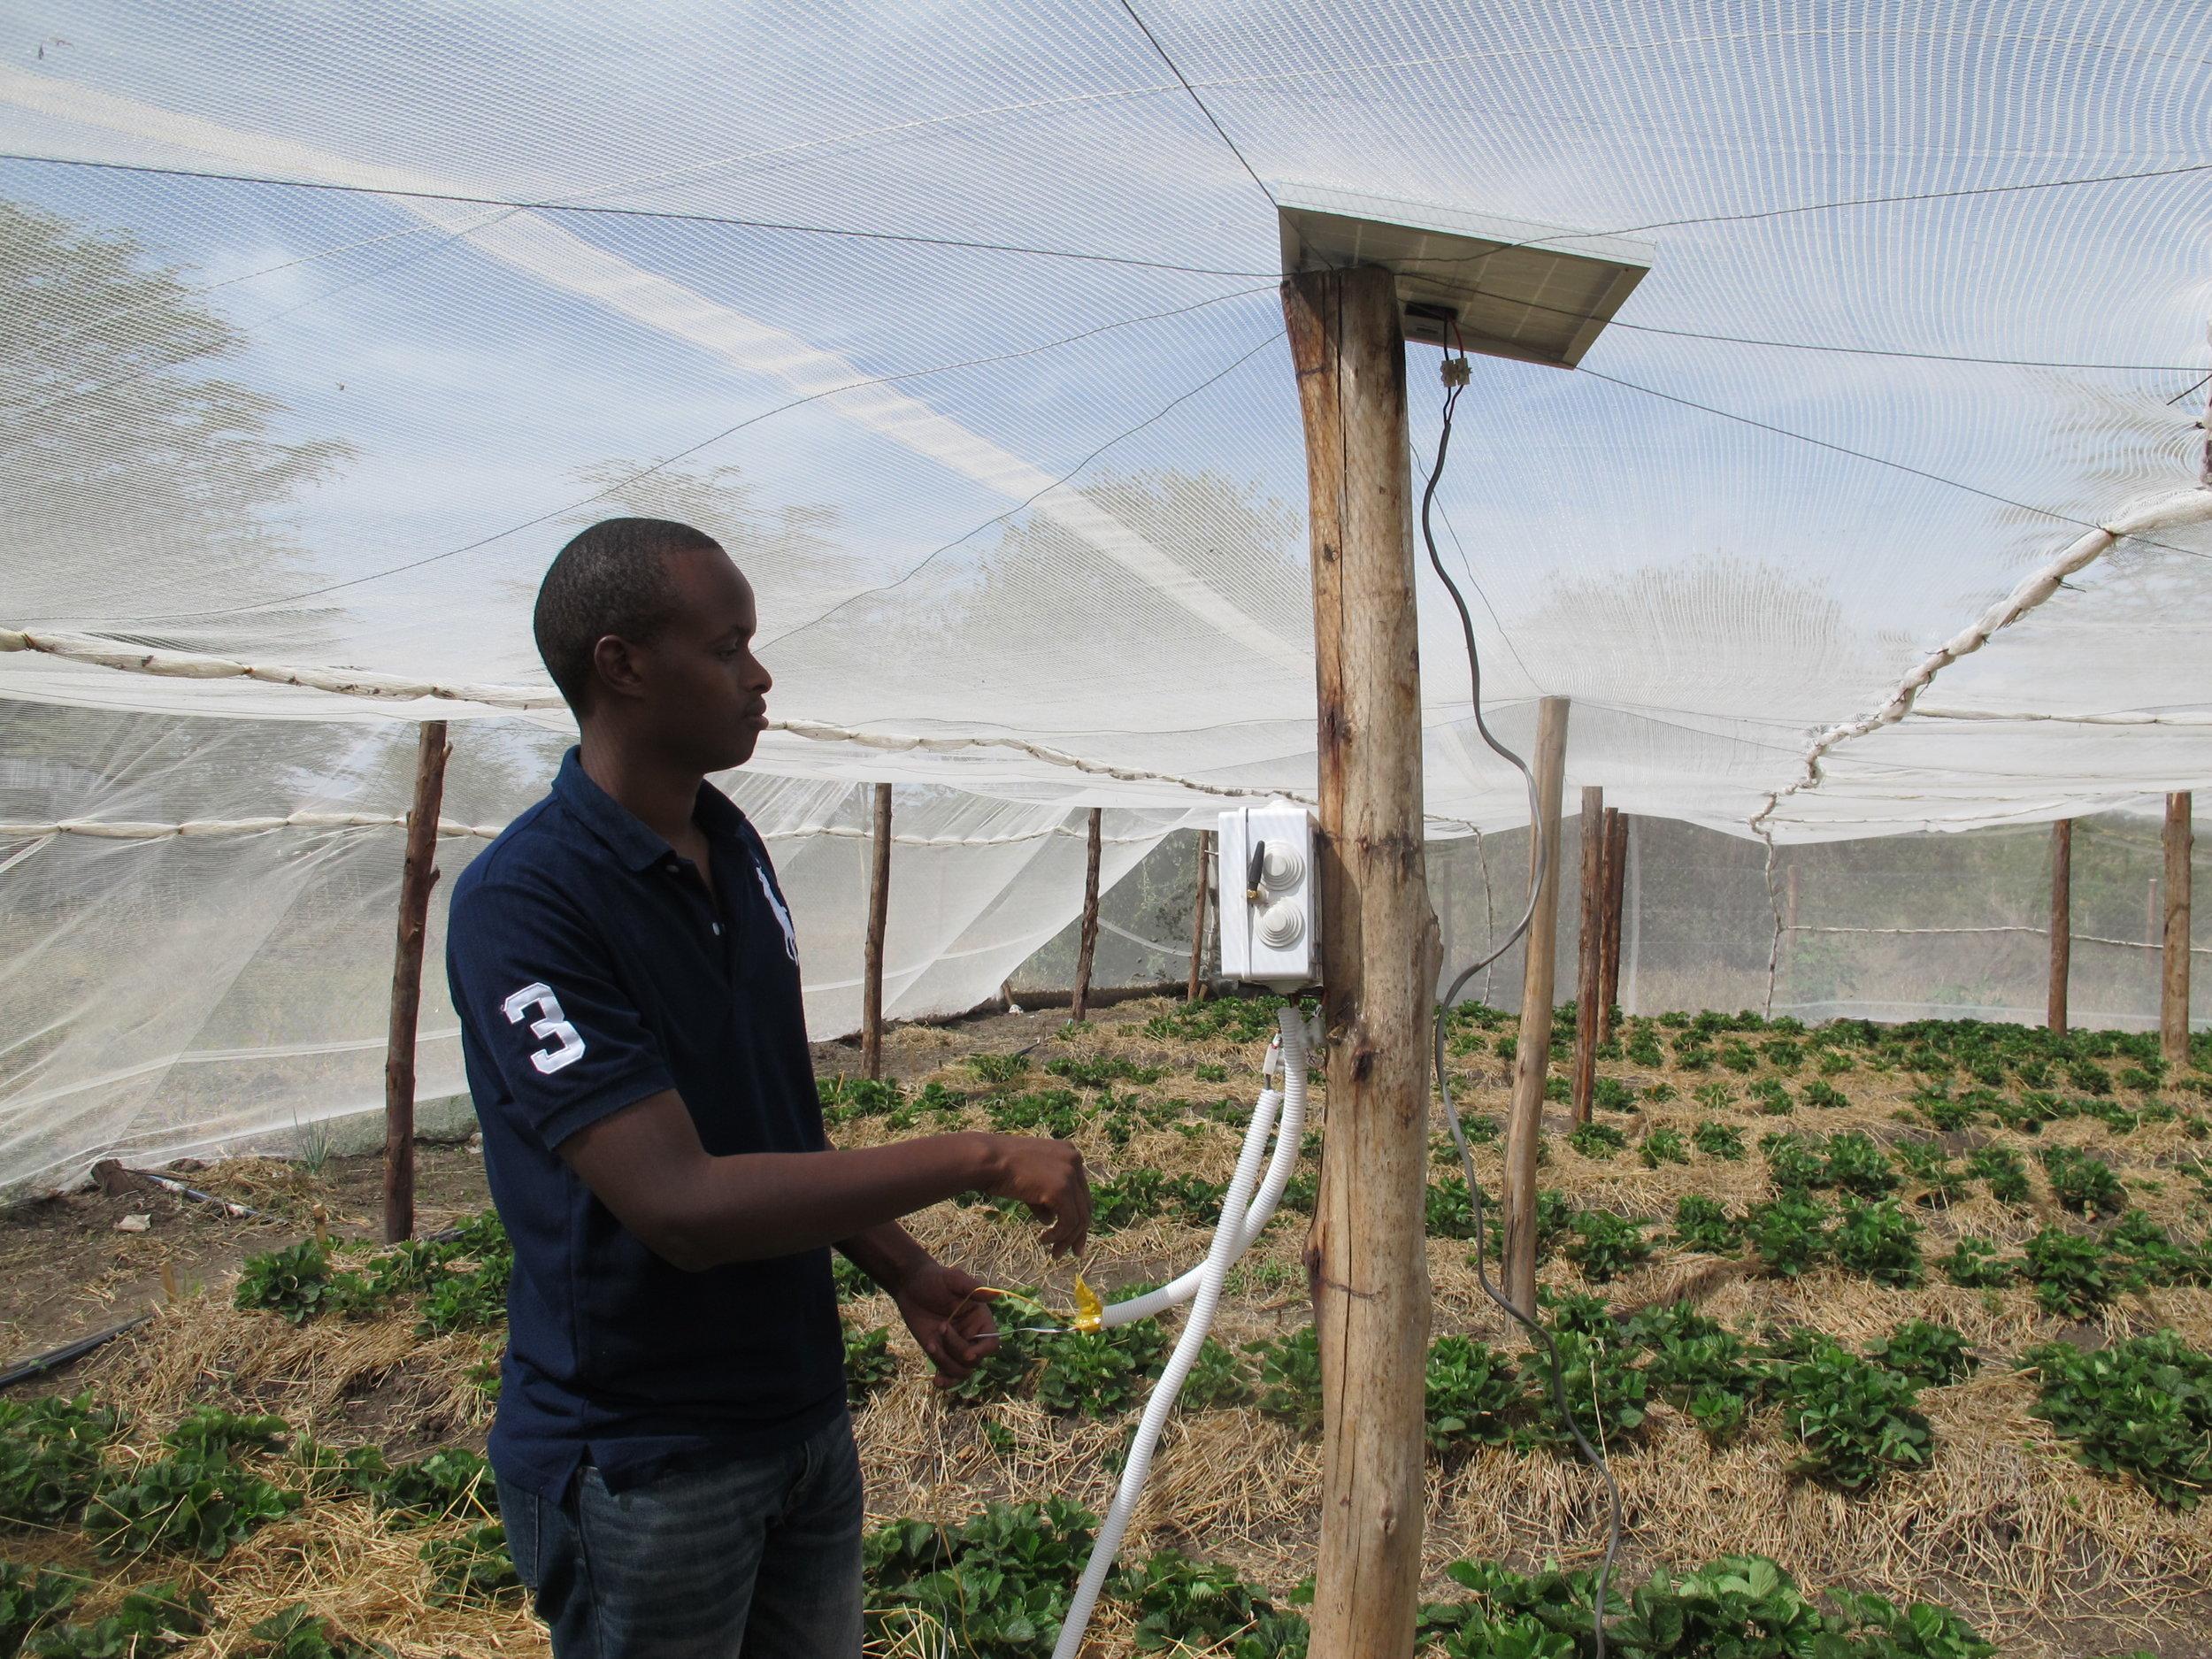 Illuminum Greenhouses co-founder Brian Bett installing a farm automation system.